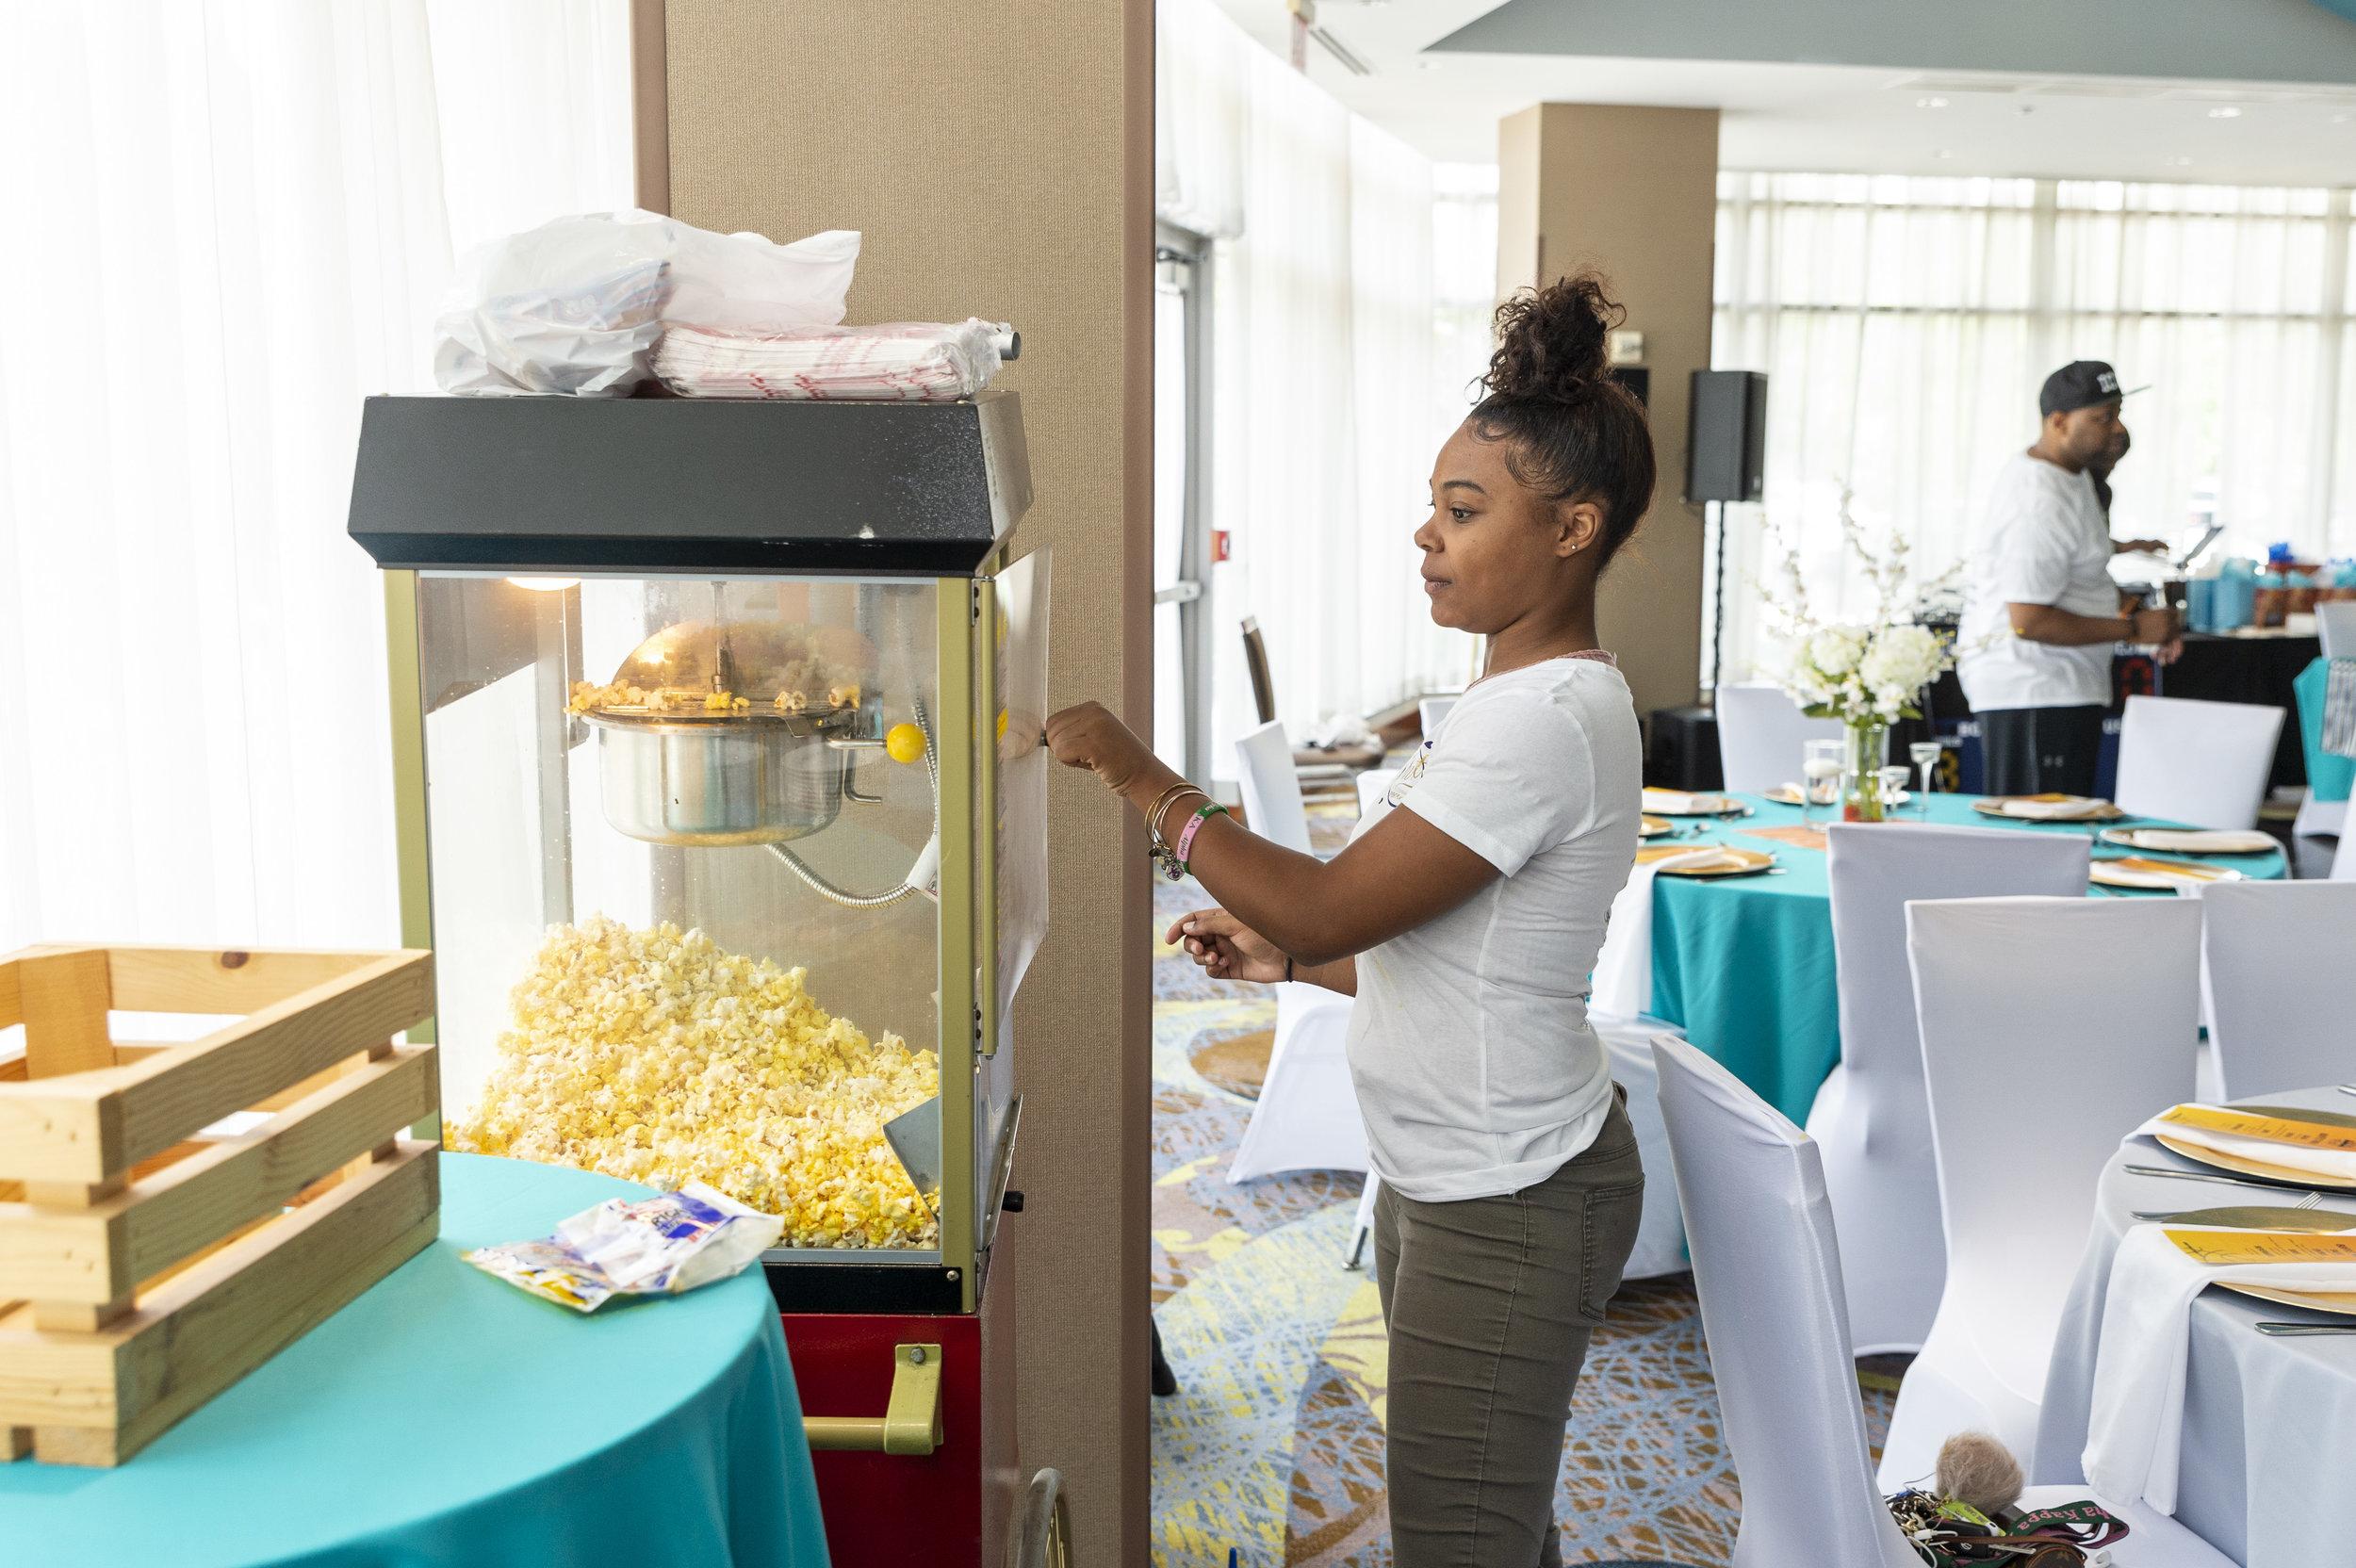 popcorn machine-baby-shower-sports-theme.jpg